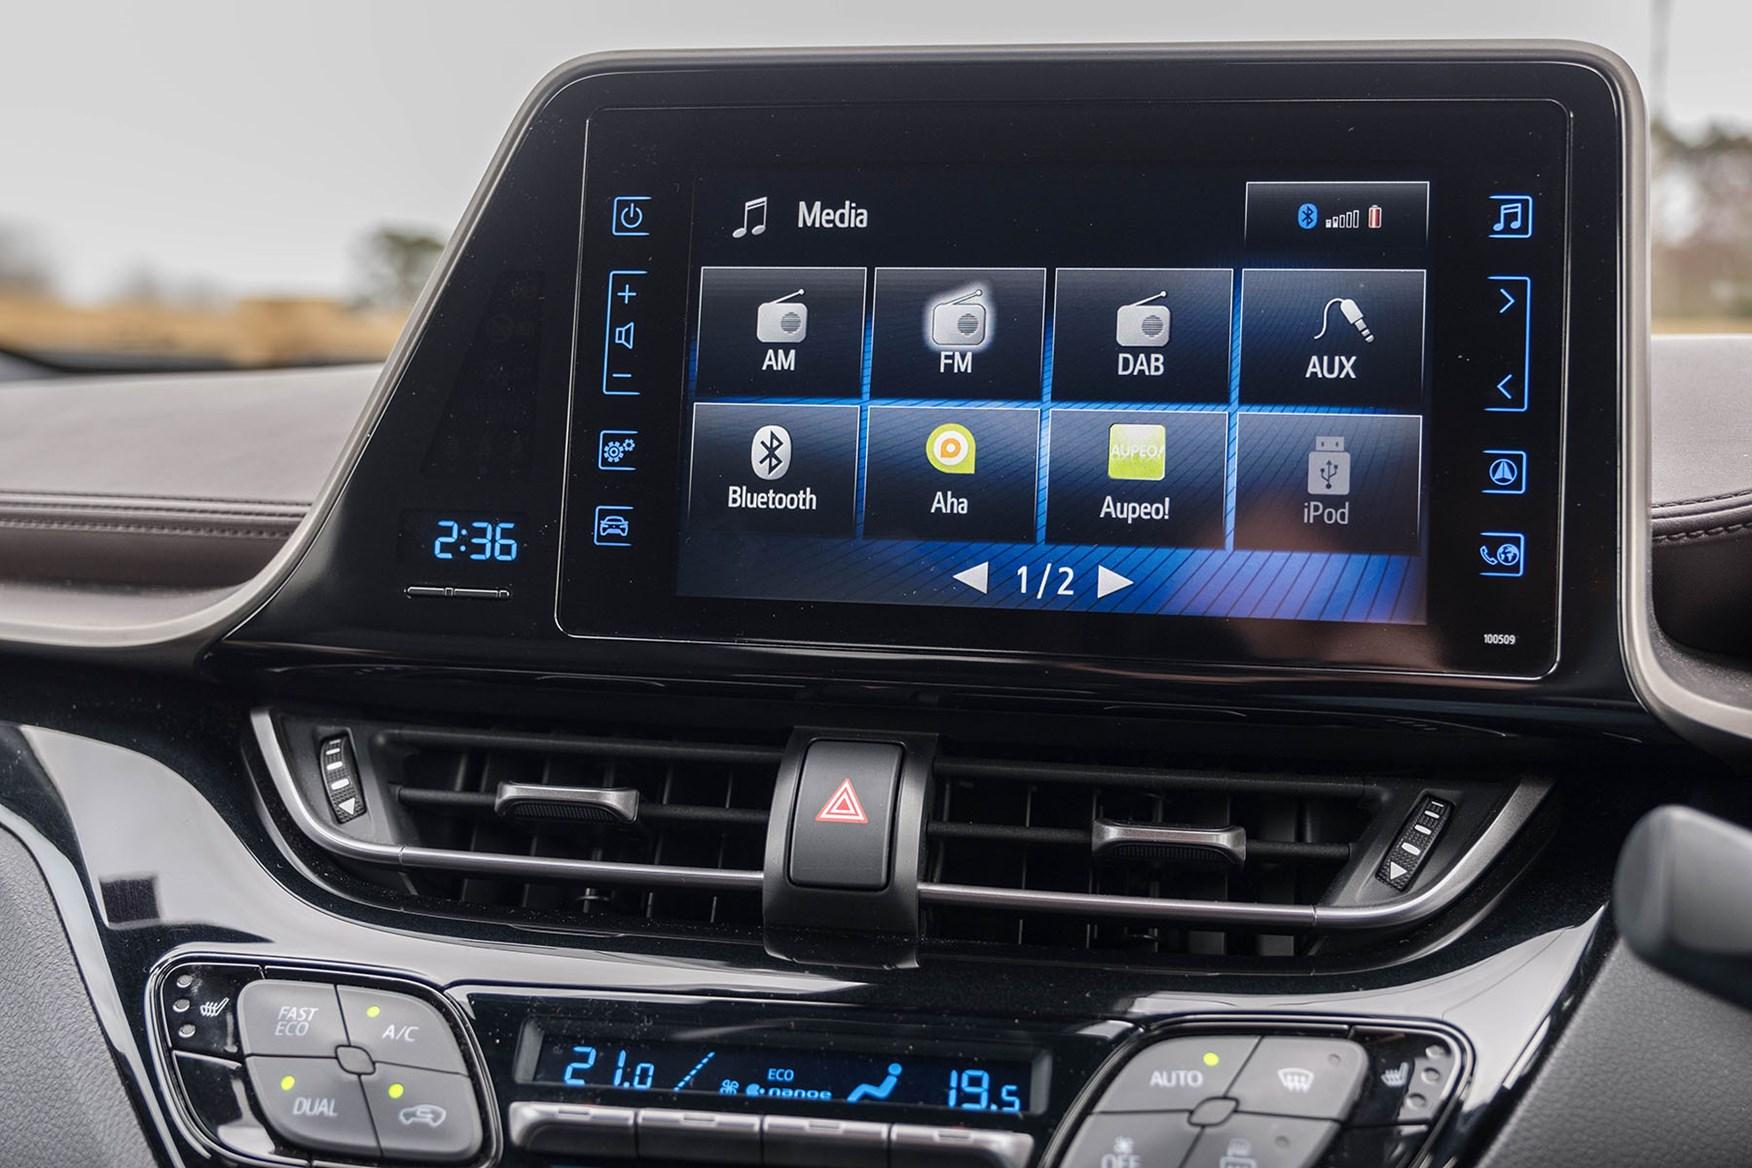 2017 Toyota C-HR infotainment display - white, Excel Hybrid